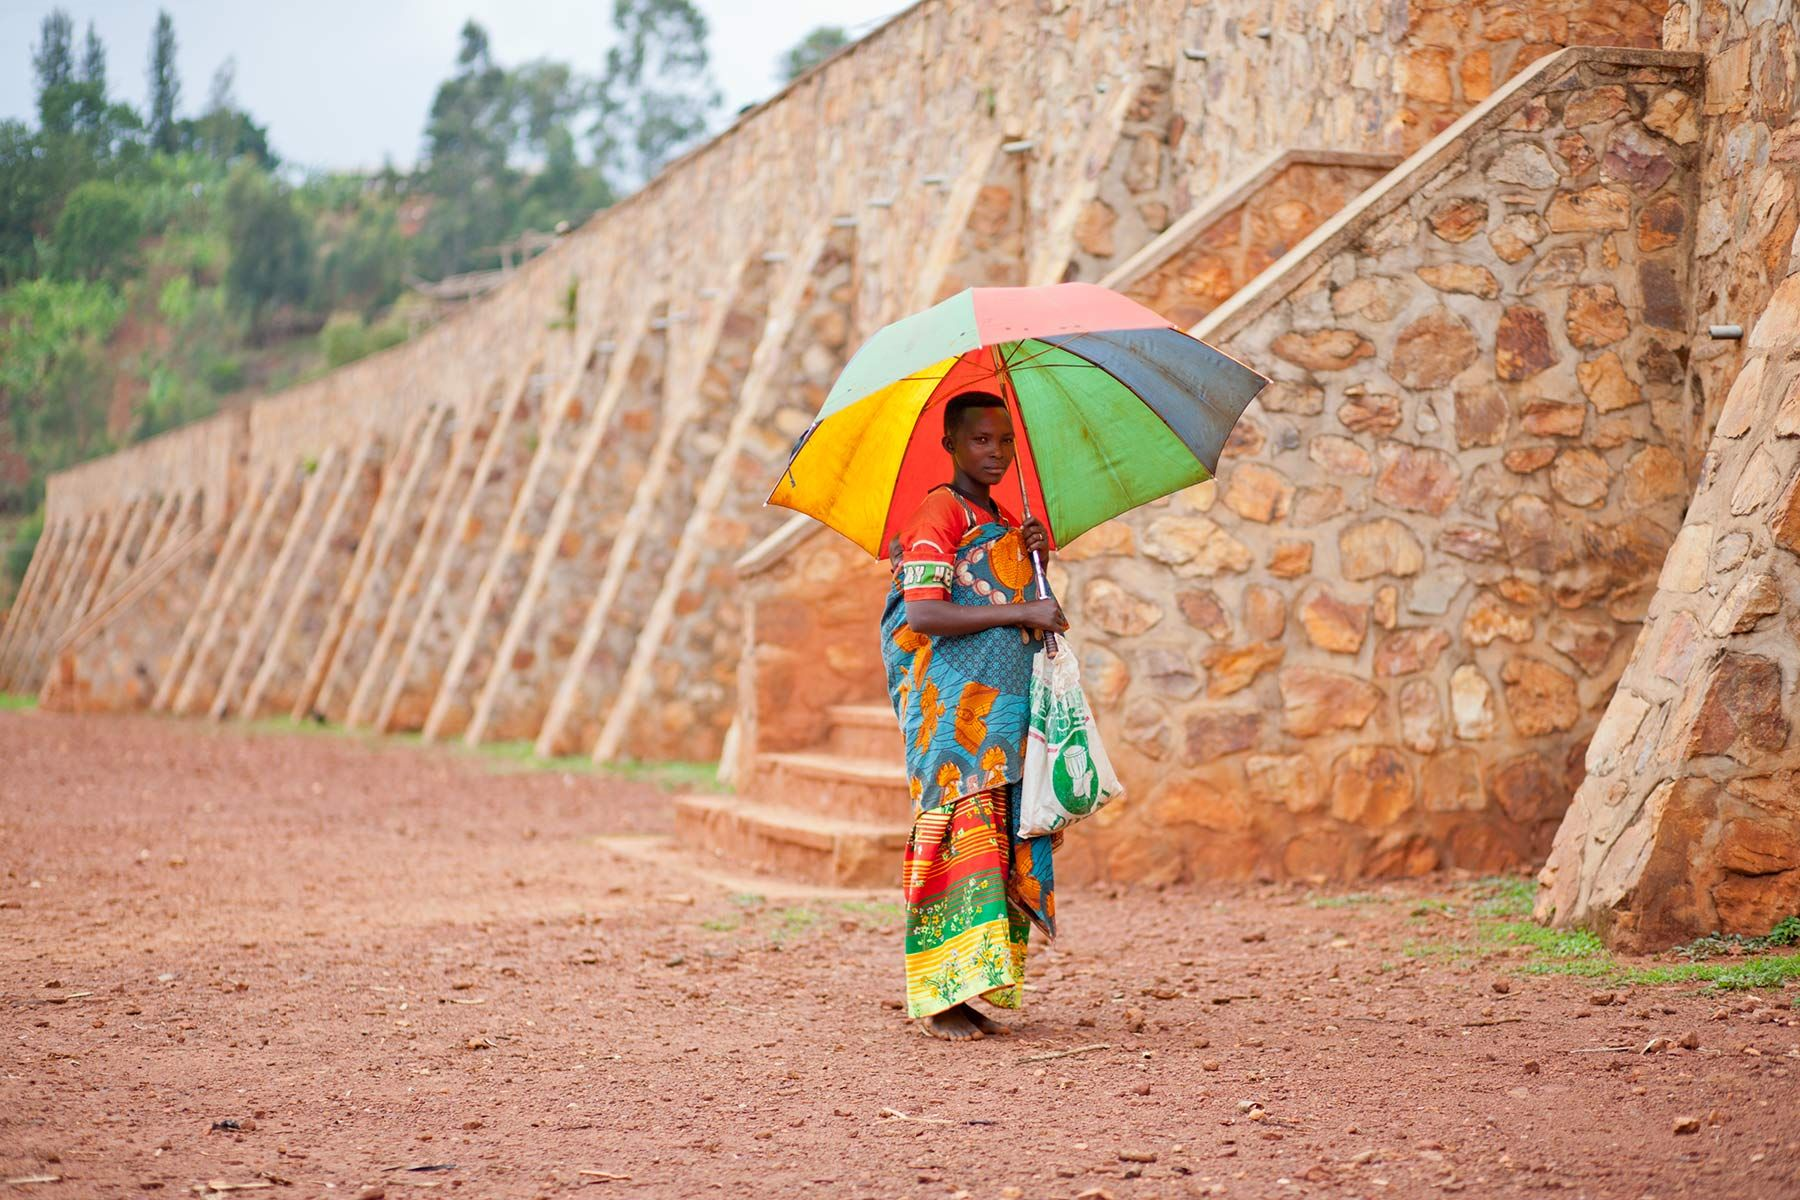 Woman-wilth-umbrella-Microfinance-loan-receipient.jpg